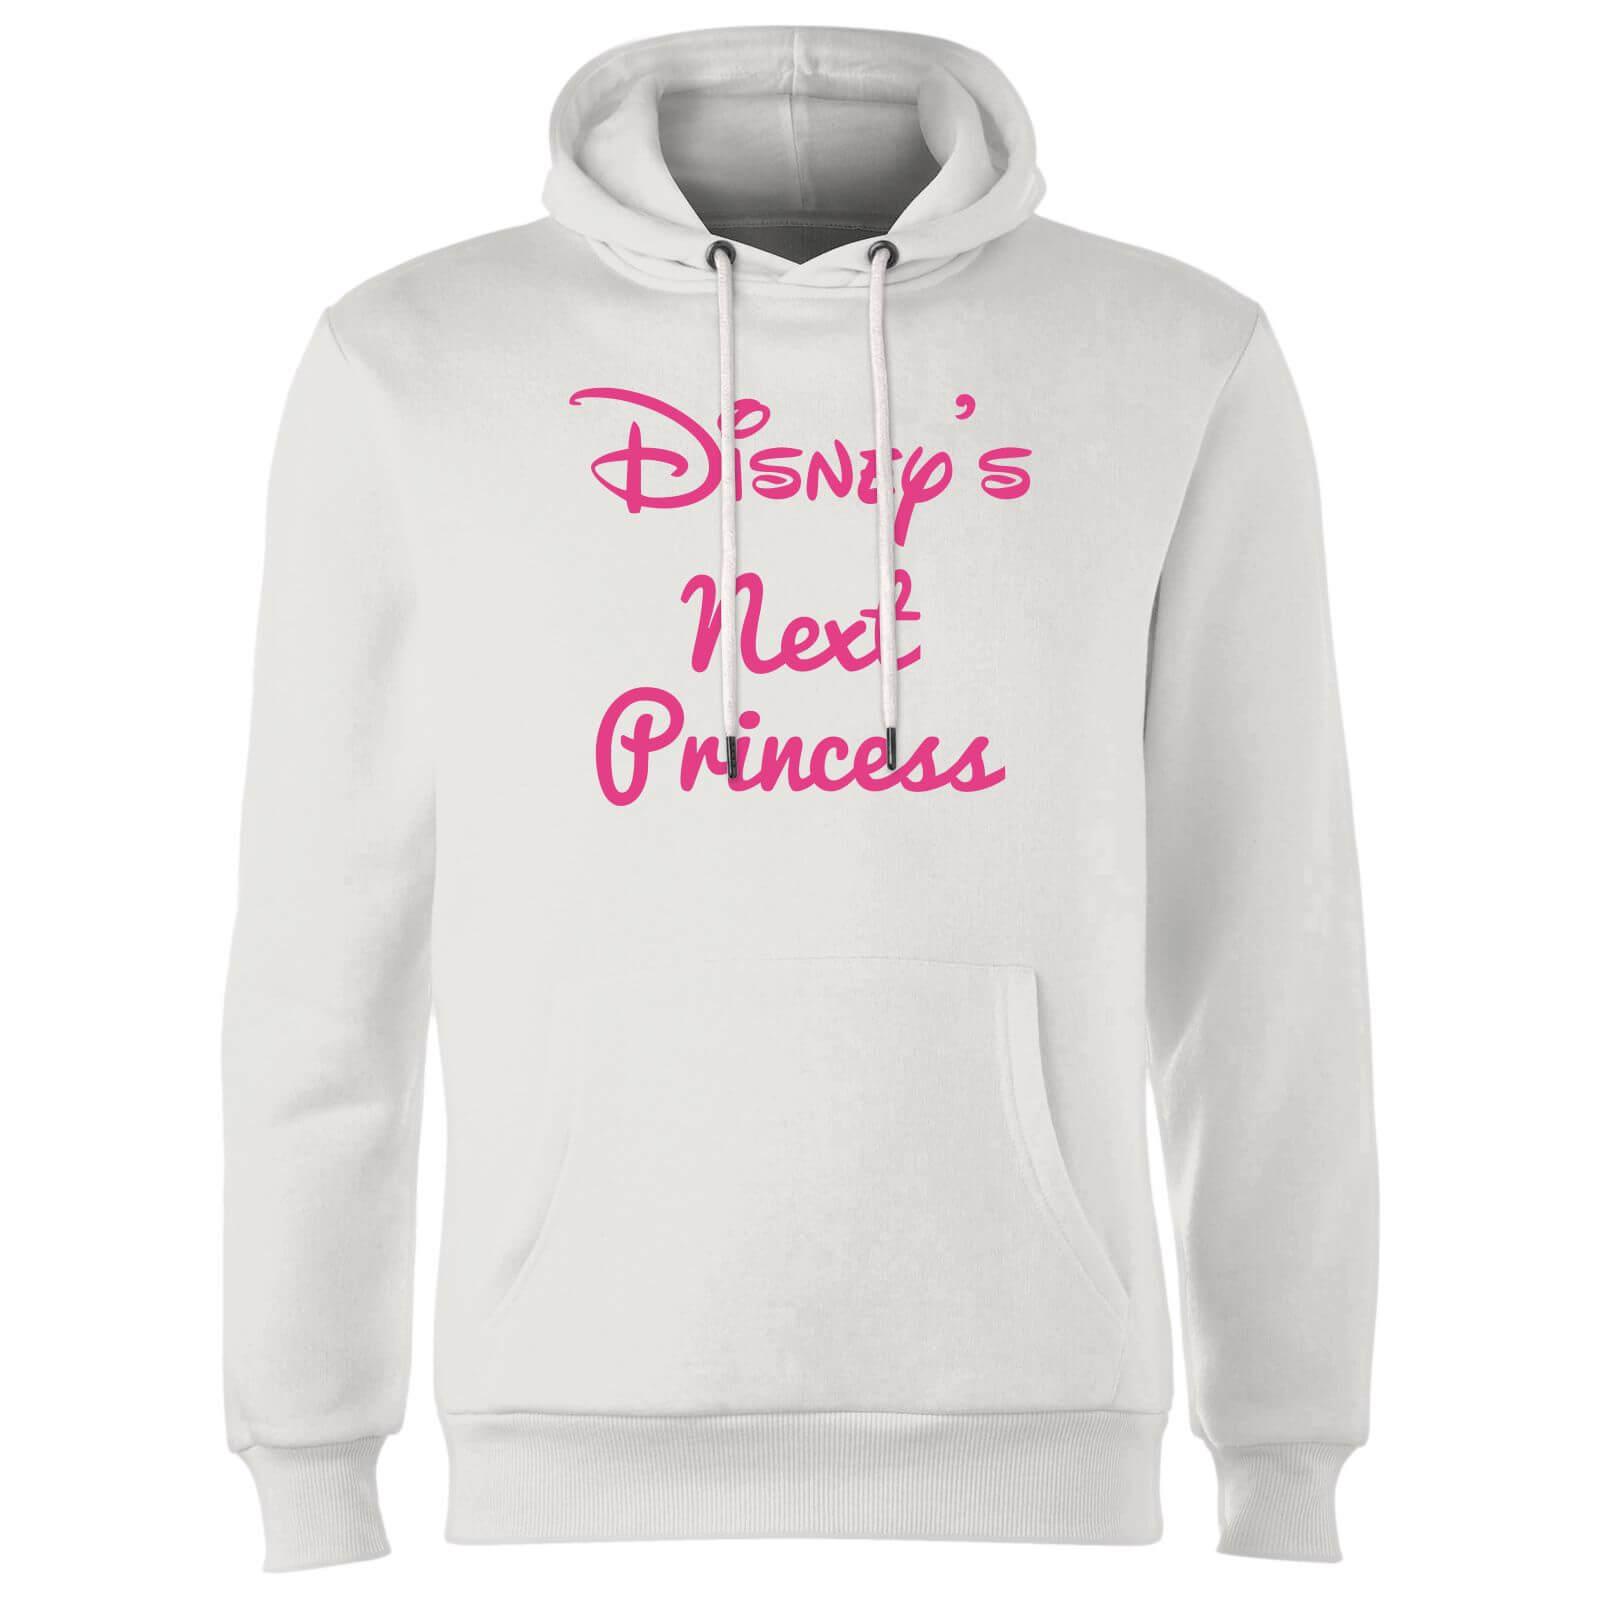 disney princess next hoodie - white - m - white